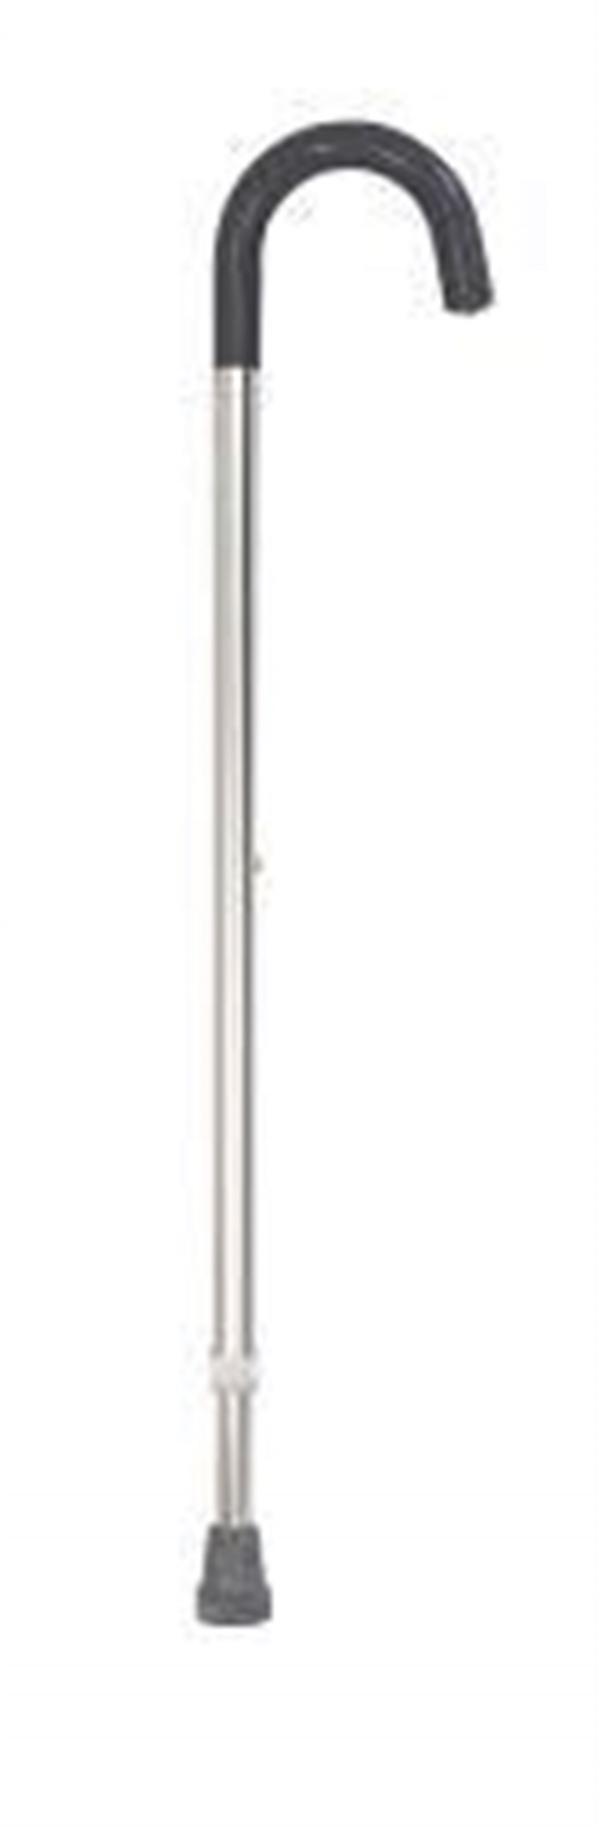 K Care Healthcare Equipment Aluminium Crook Handle Height Adjustable Walking Stick